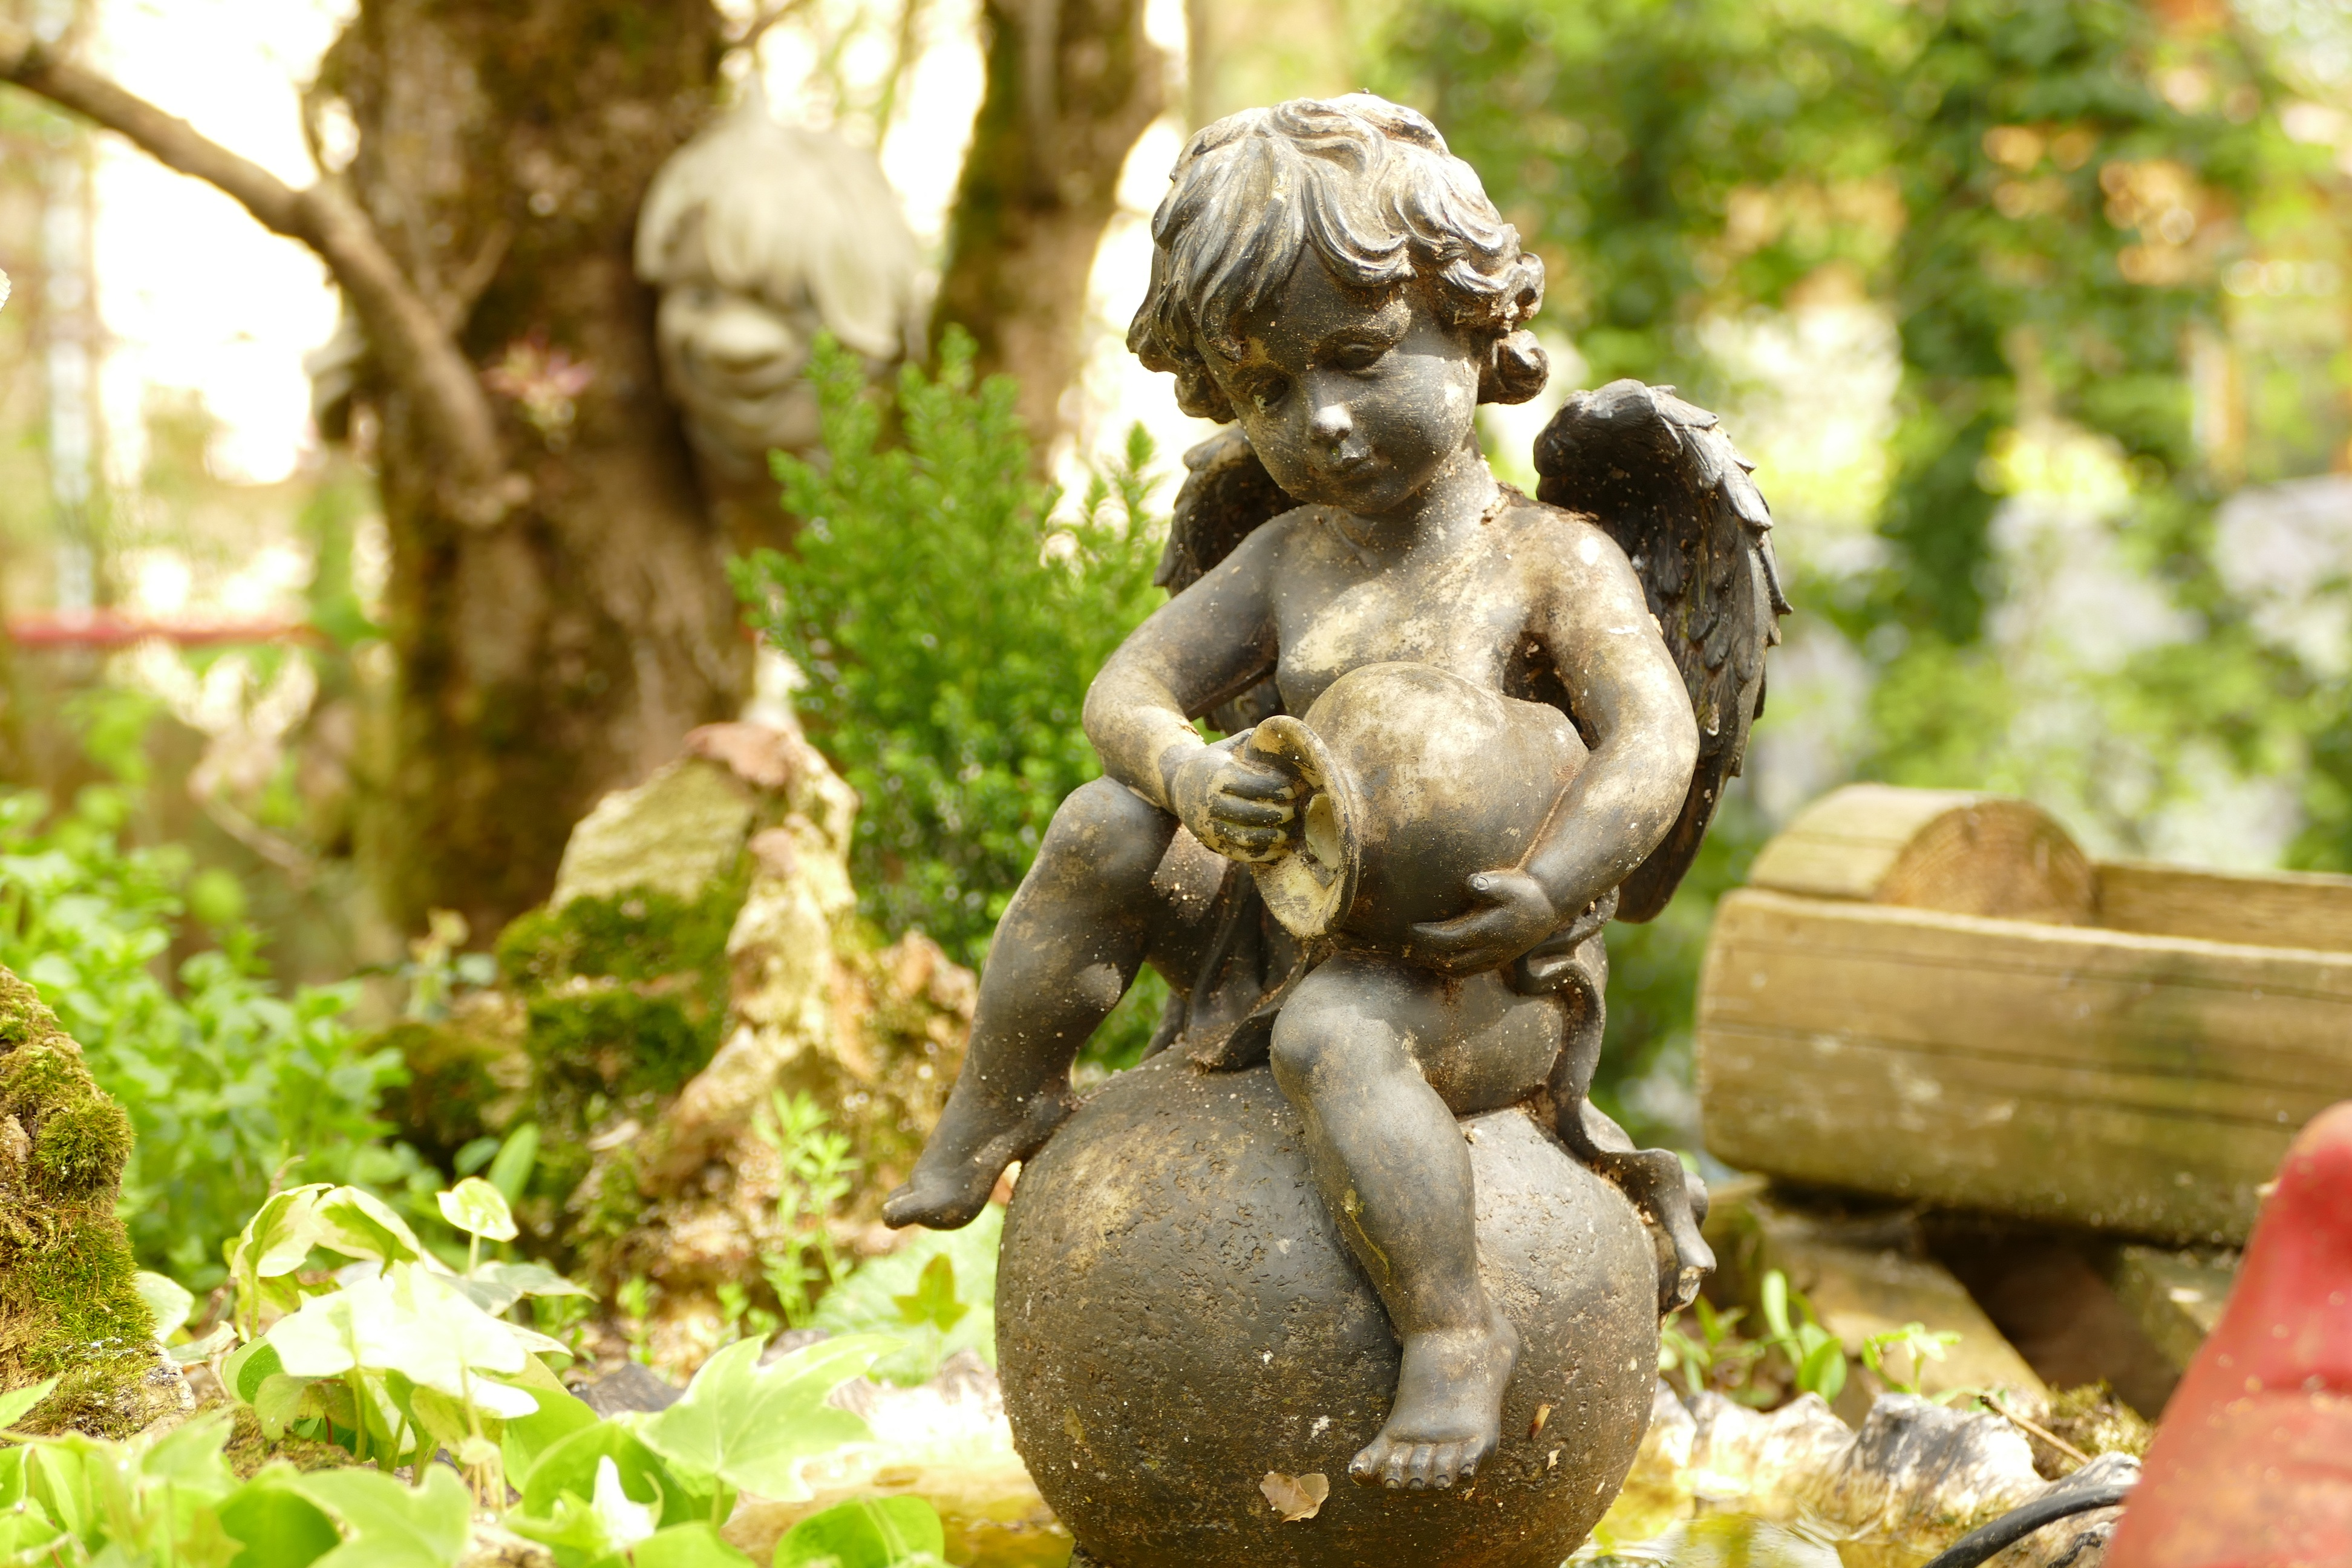 A cherub statue in a garden 4k Ultra HD Wallpaper Background 3888x2592